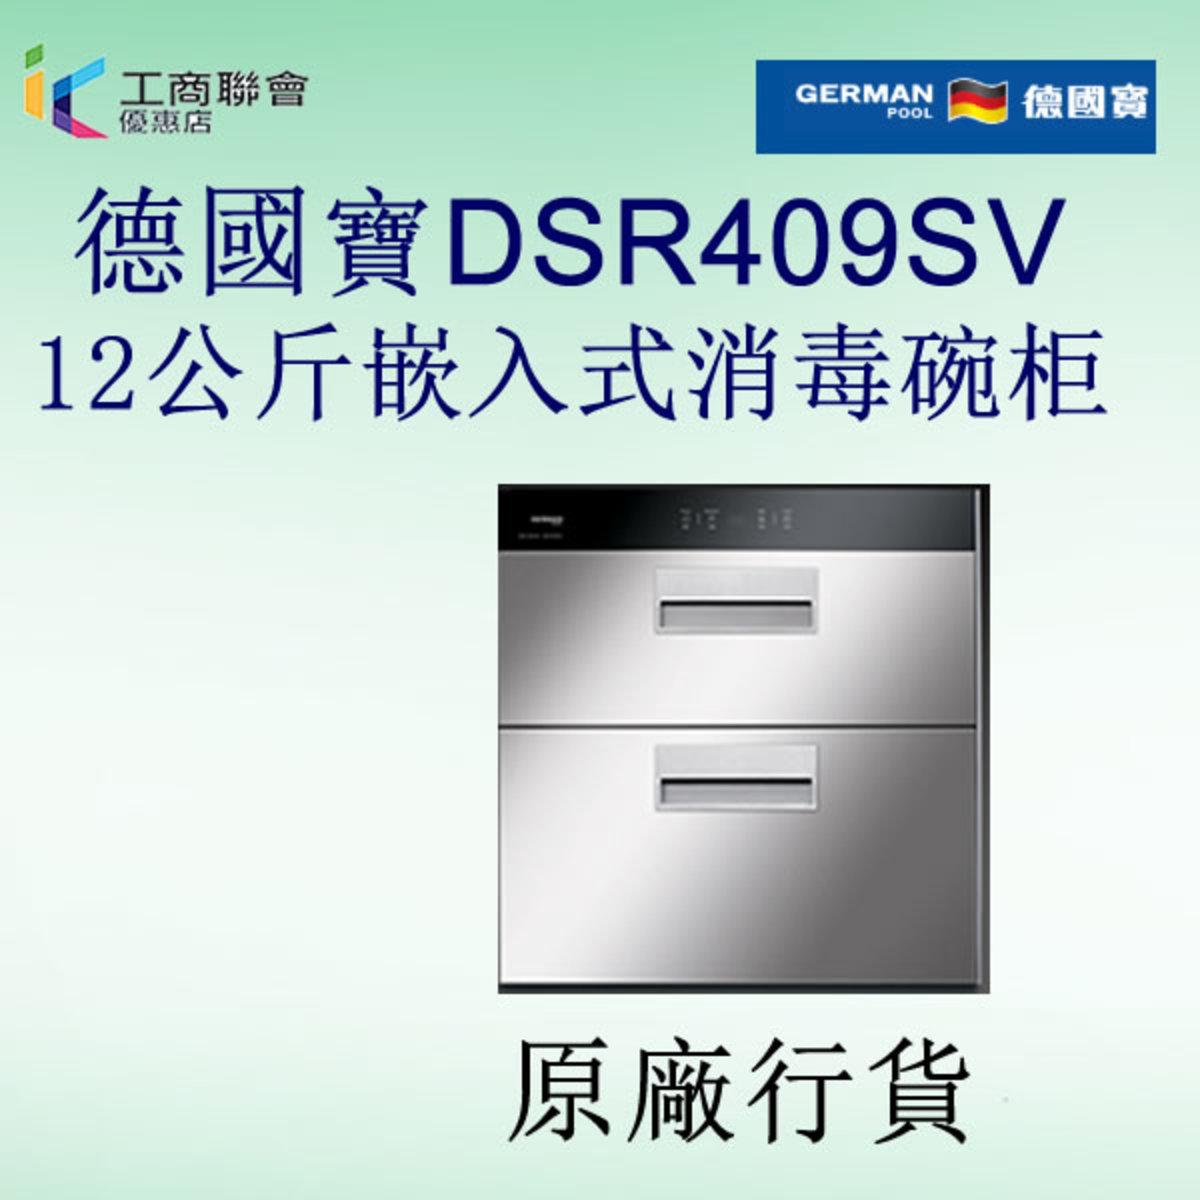 DSR409SV 12公斤 嵌入式消毒碗柜